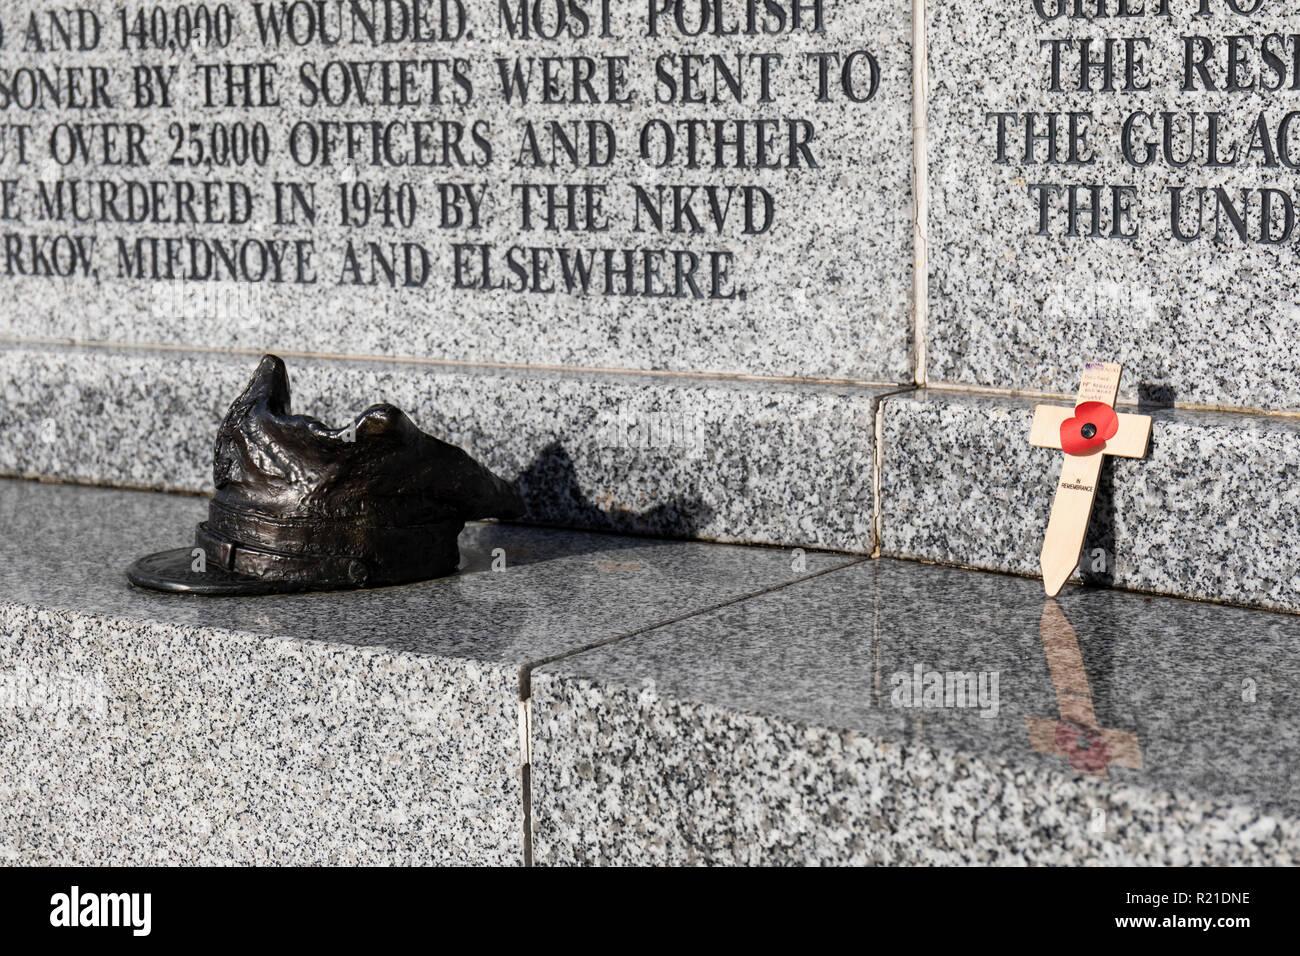 The Polish Forces War Memorial, The National Memorial Arboretum, Airewas, Staffordshire, UK - Stock Image